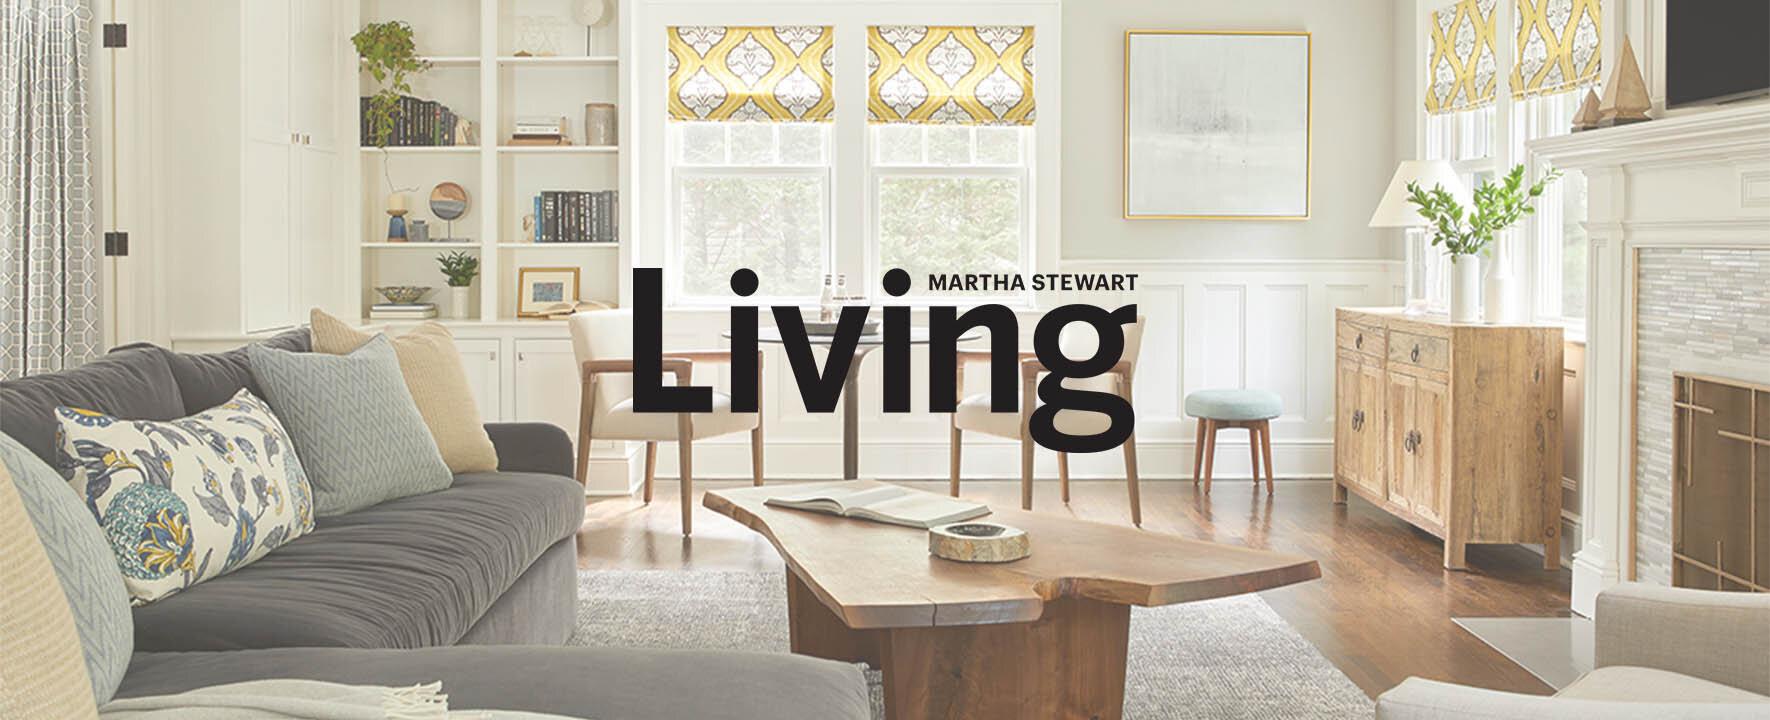 Martha Stewart Living.jpg